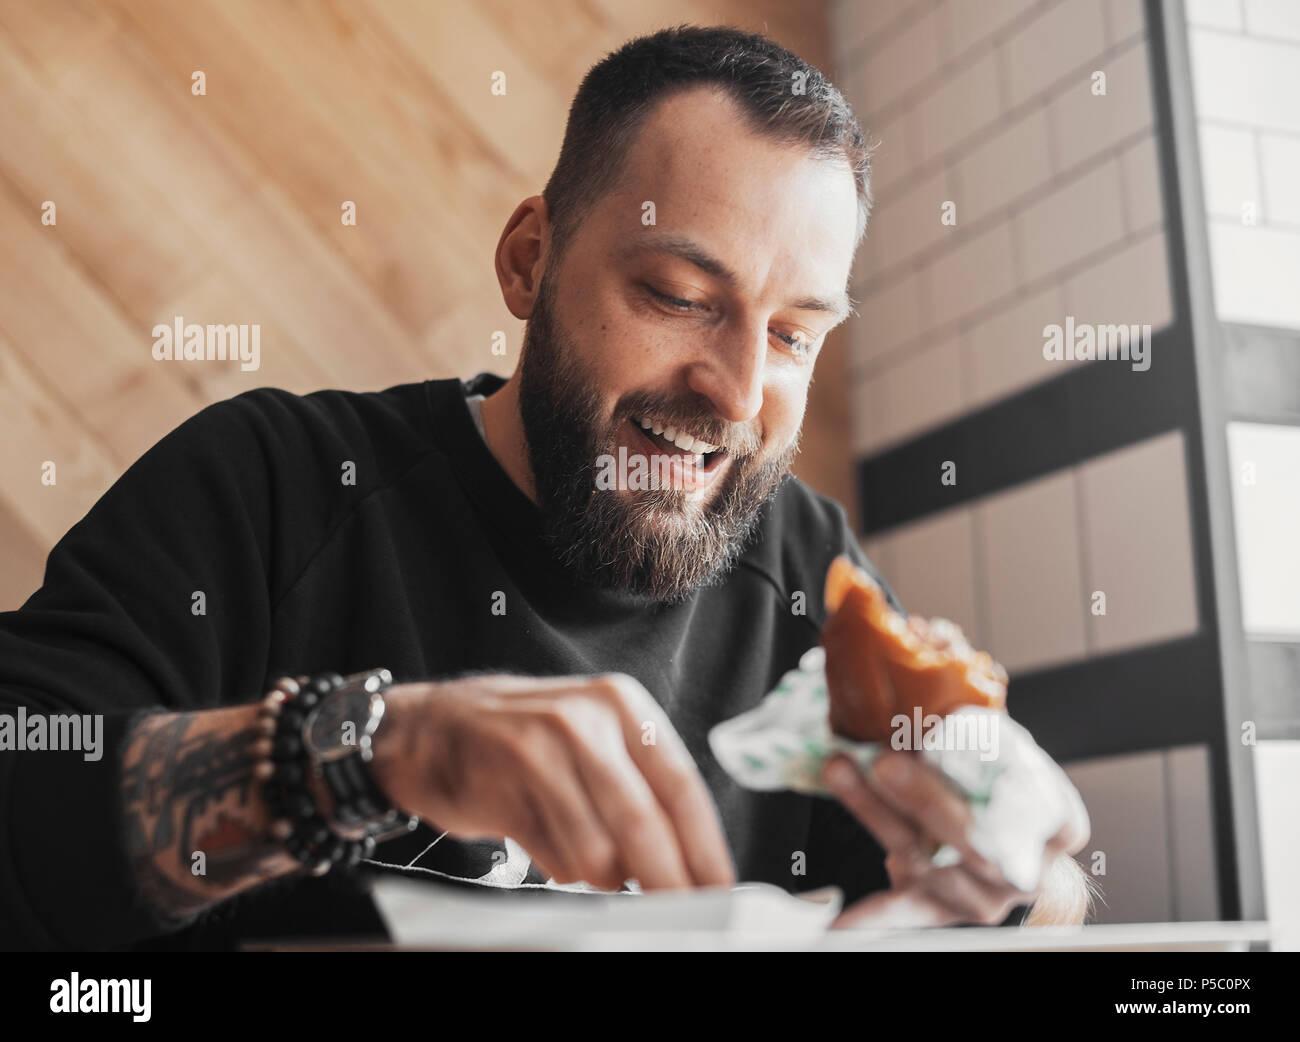 Jeune homme barbu manger burger et smiling close up. Photo Stock